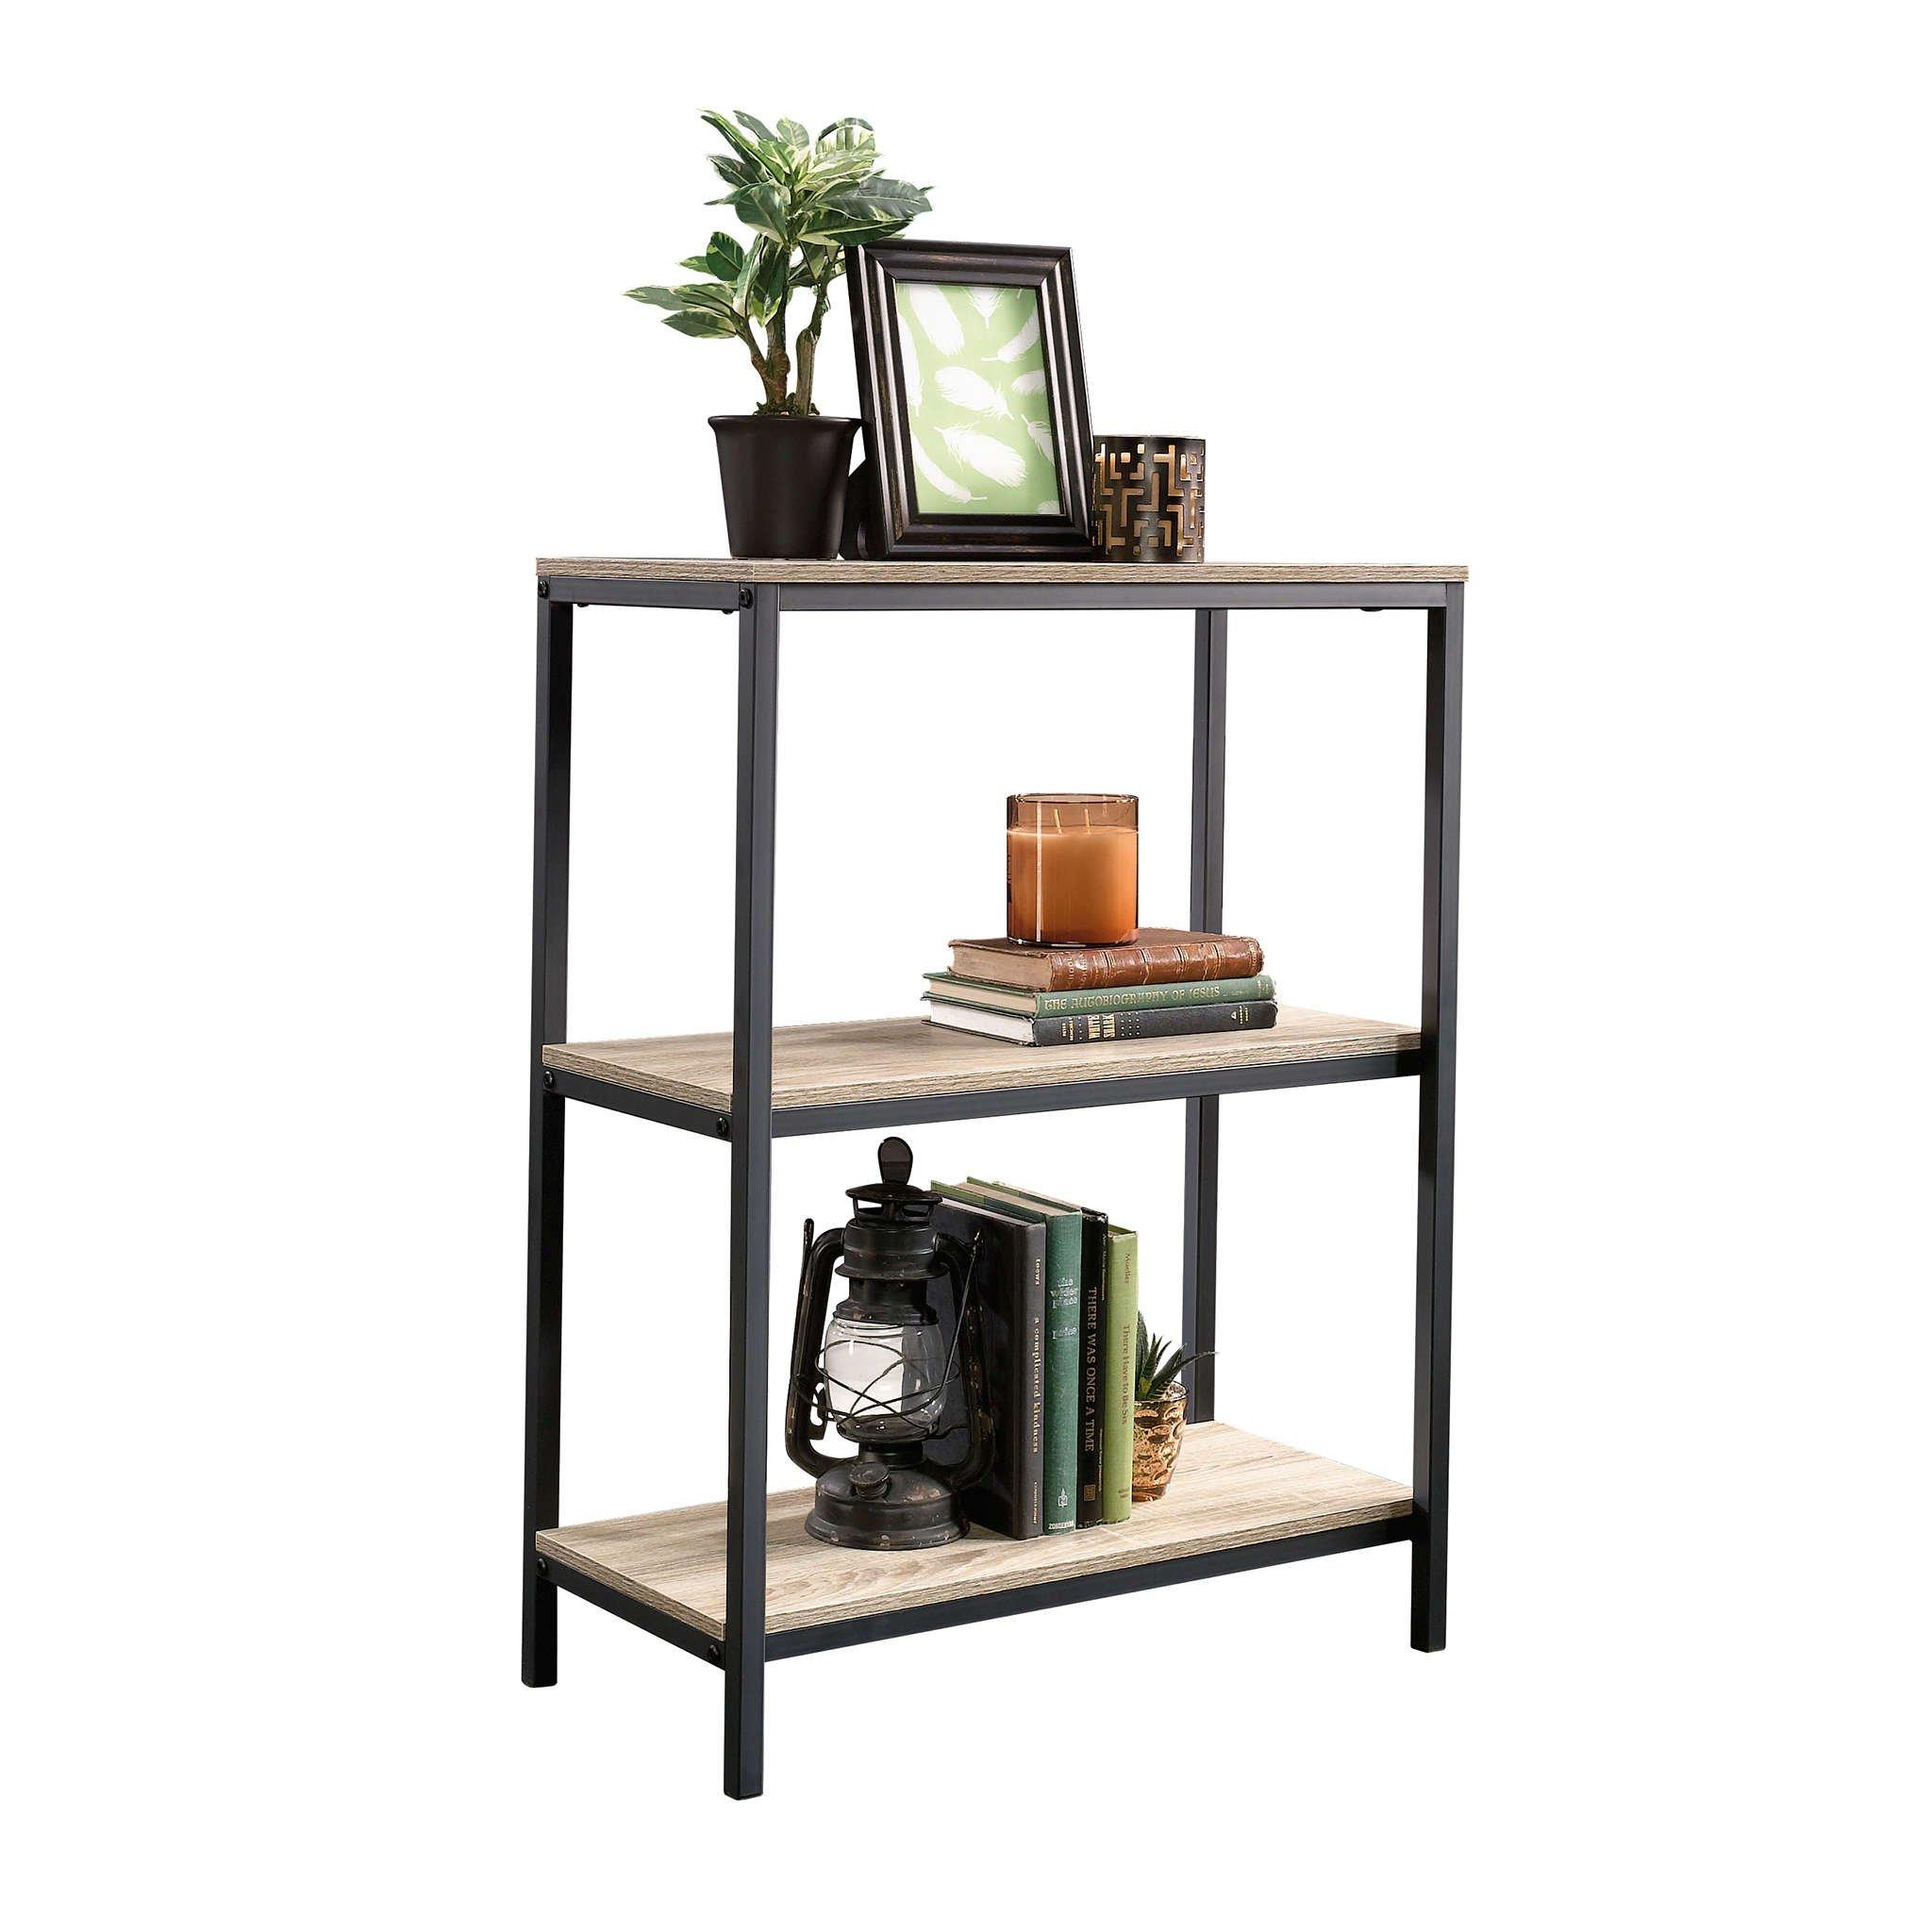 Sauder 420276 Bookcases, Furniture North Avenue, Characters Oak